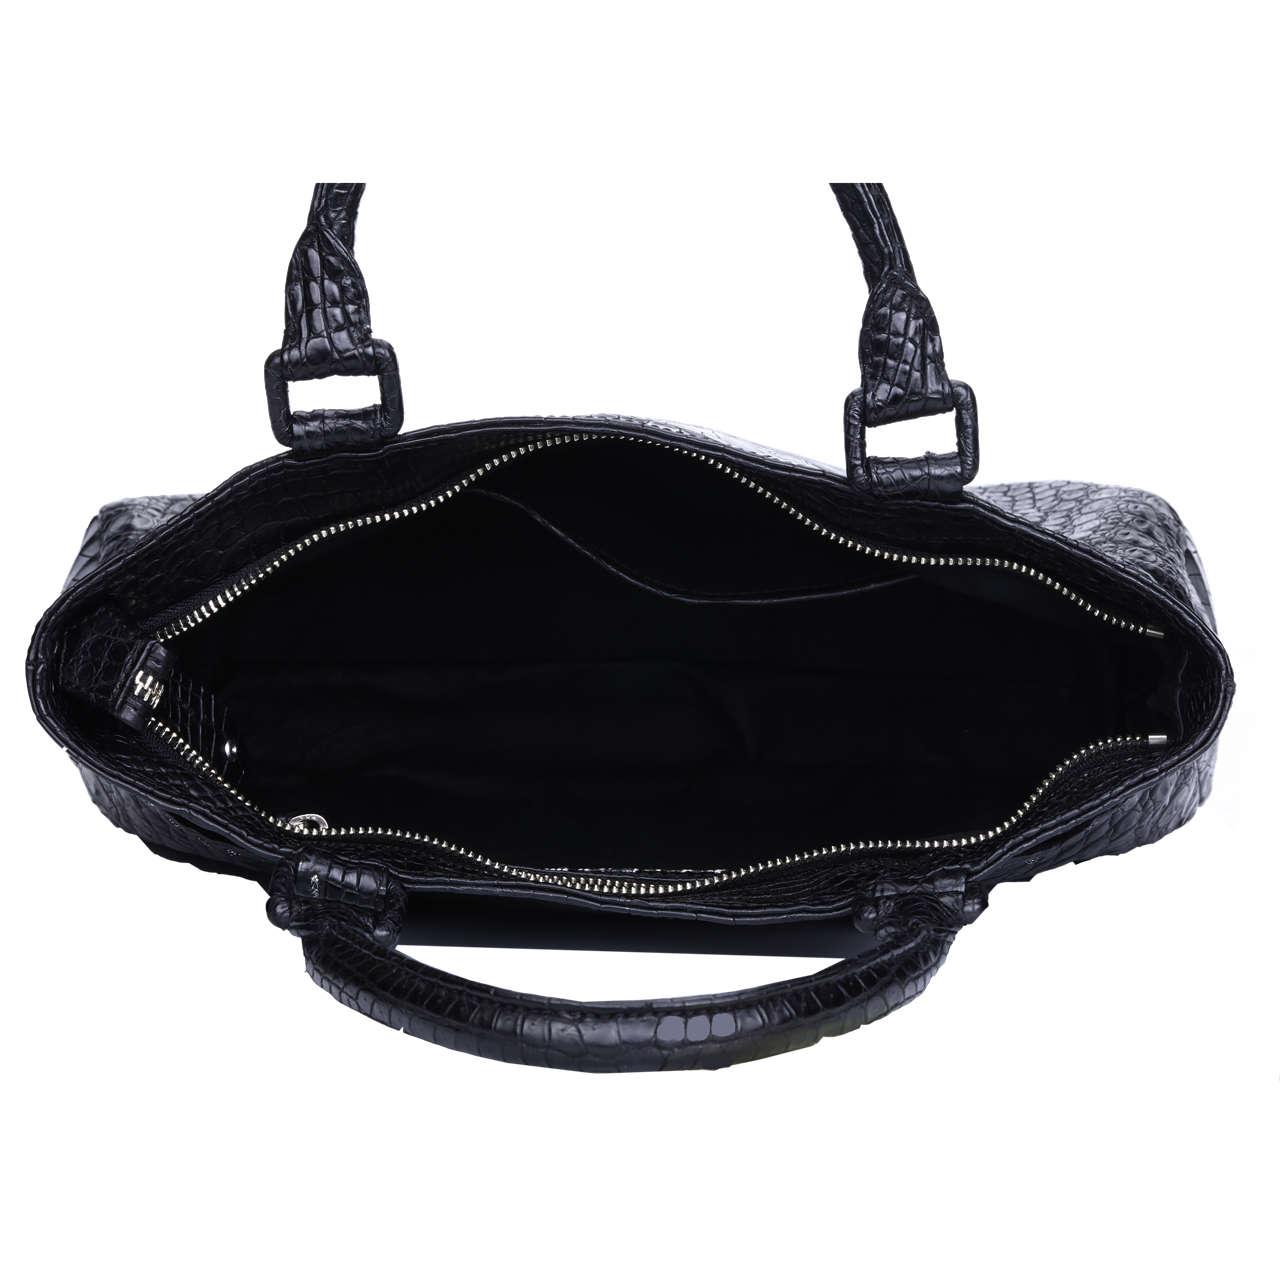 GF bags-Custom Latest Handbags Manufacturer, Cheap Handbags Online | Handbag-7